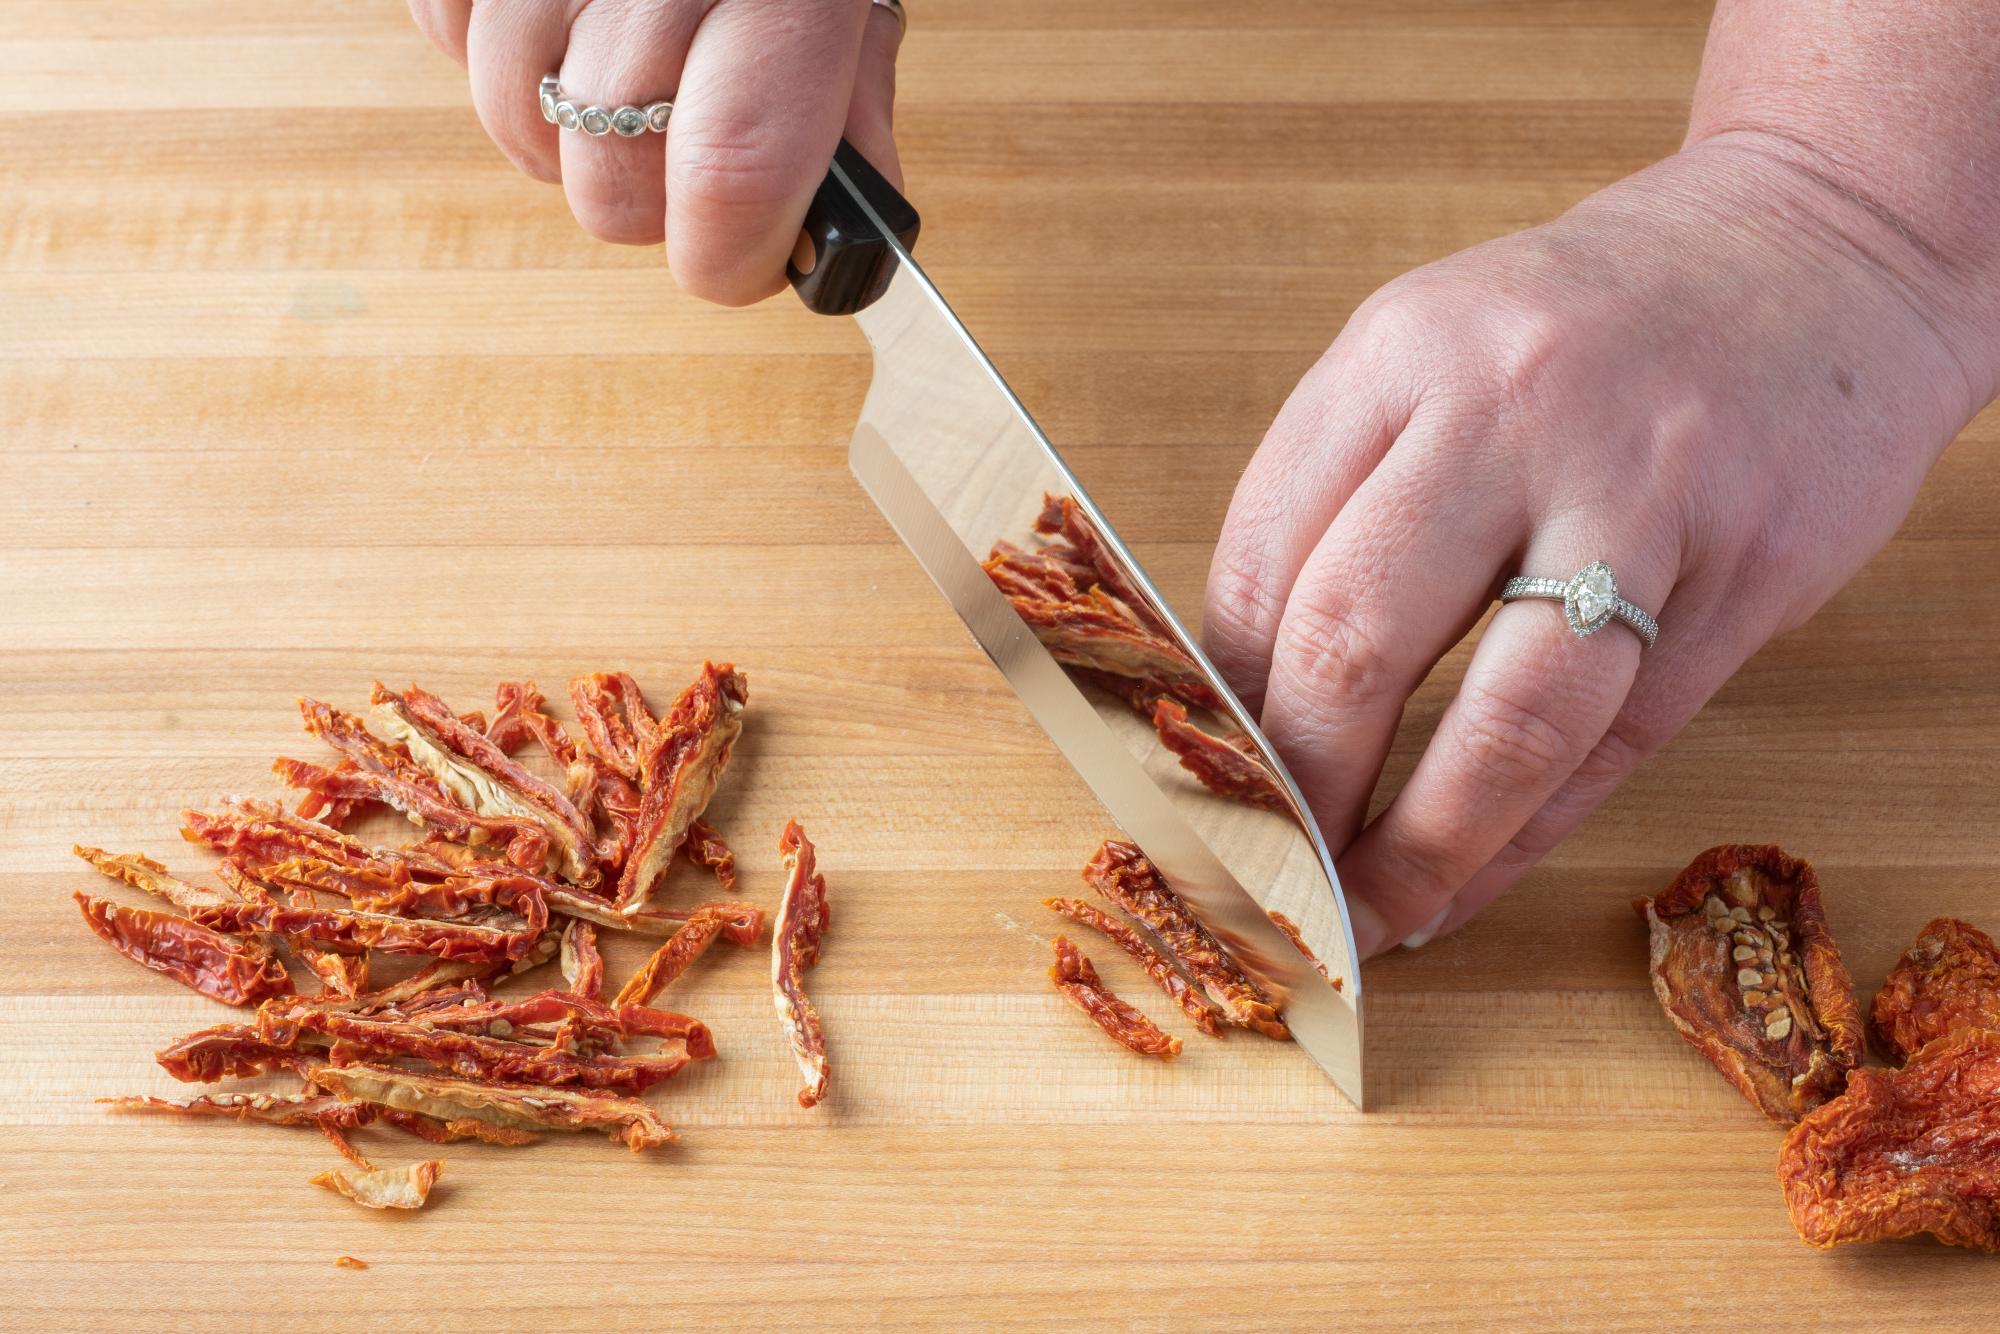 Using the Petite Santoku to slice the sun-dried tomatoes.